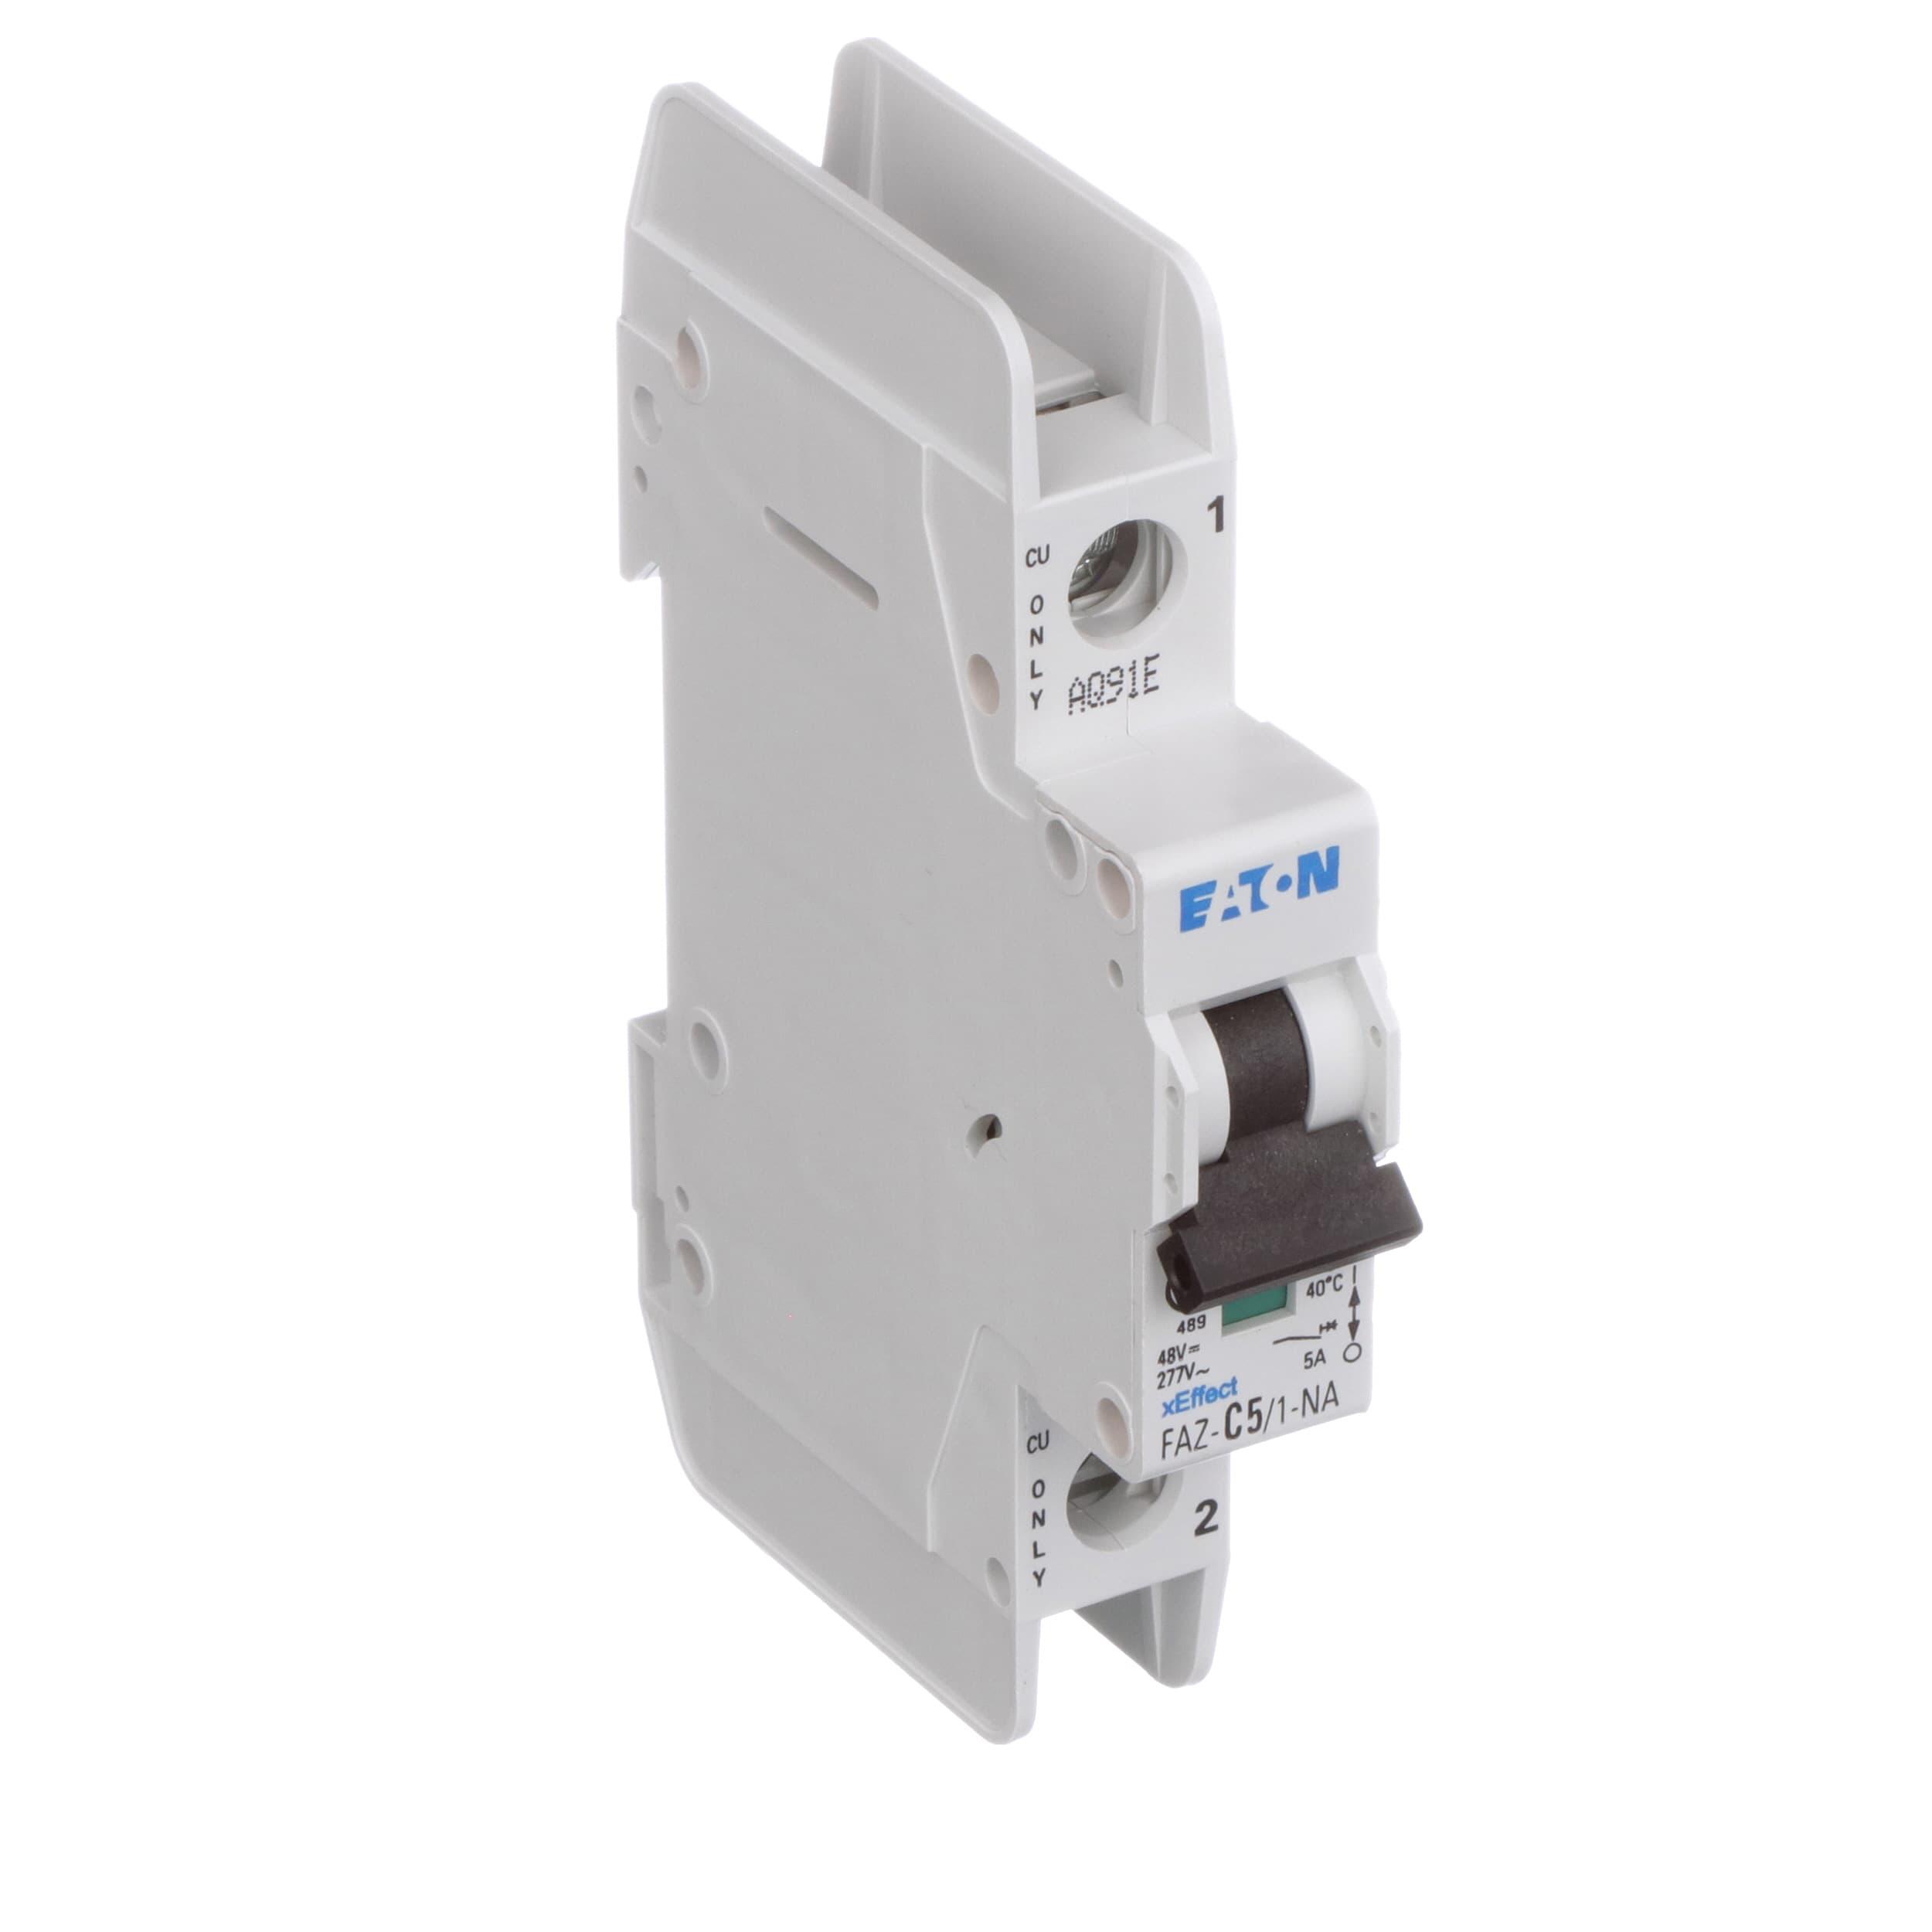 Eaton Cutler Hammer Faz C5 1 Na Sp Circuit Breaker Remote Control Breakers Electronic Design Supplementary C Curve 5a Pole Single Pkg Ul 489 Screw Allied Electronics Automation